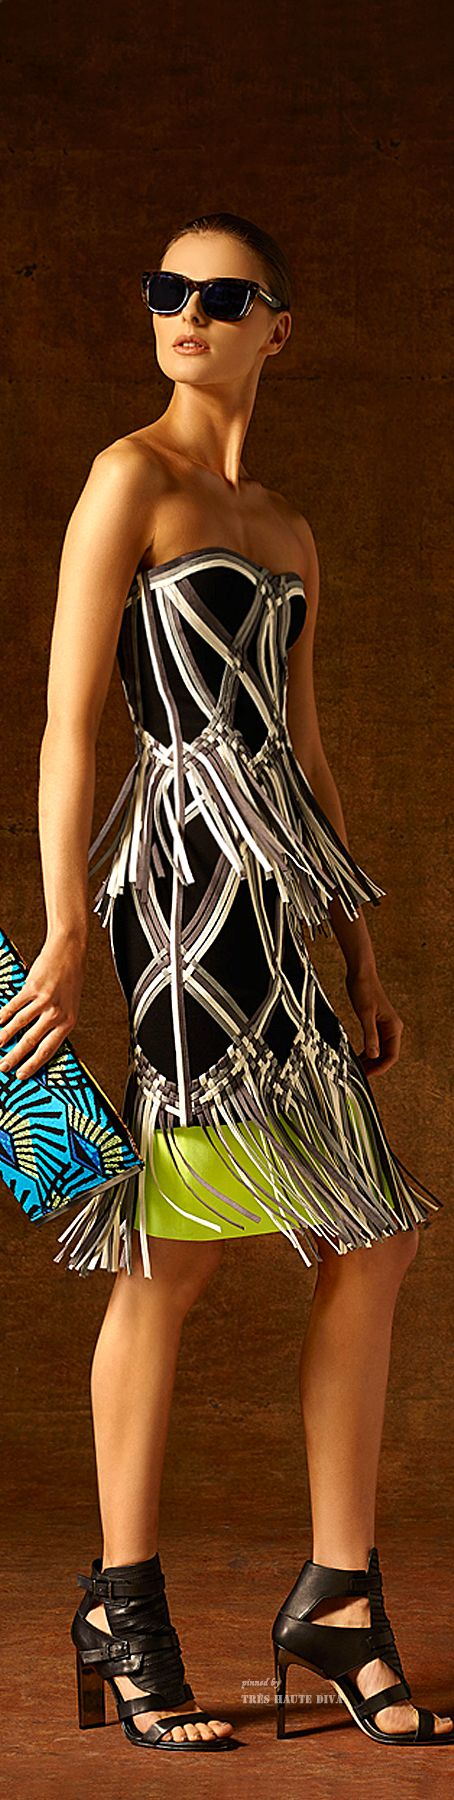 Hervé Léger by Max Azria  Pre-Fall 2015 Lookbook ~ Strapless Black+Kiwi Midi w Embroidery Fringe Details